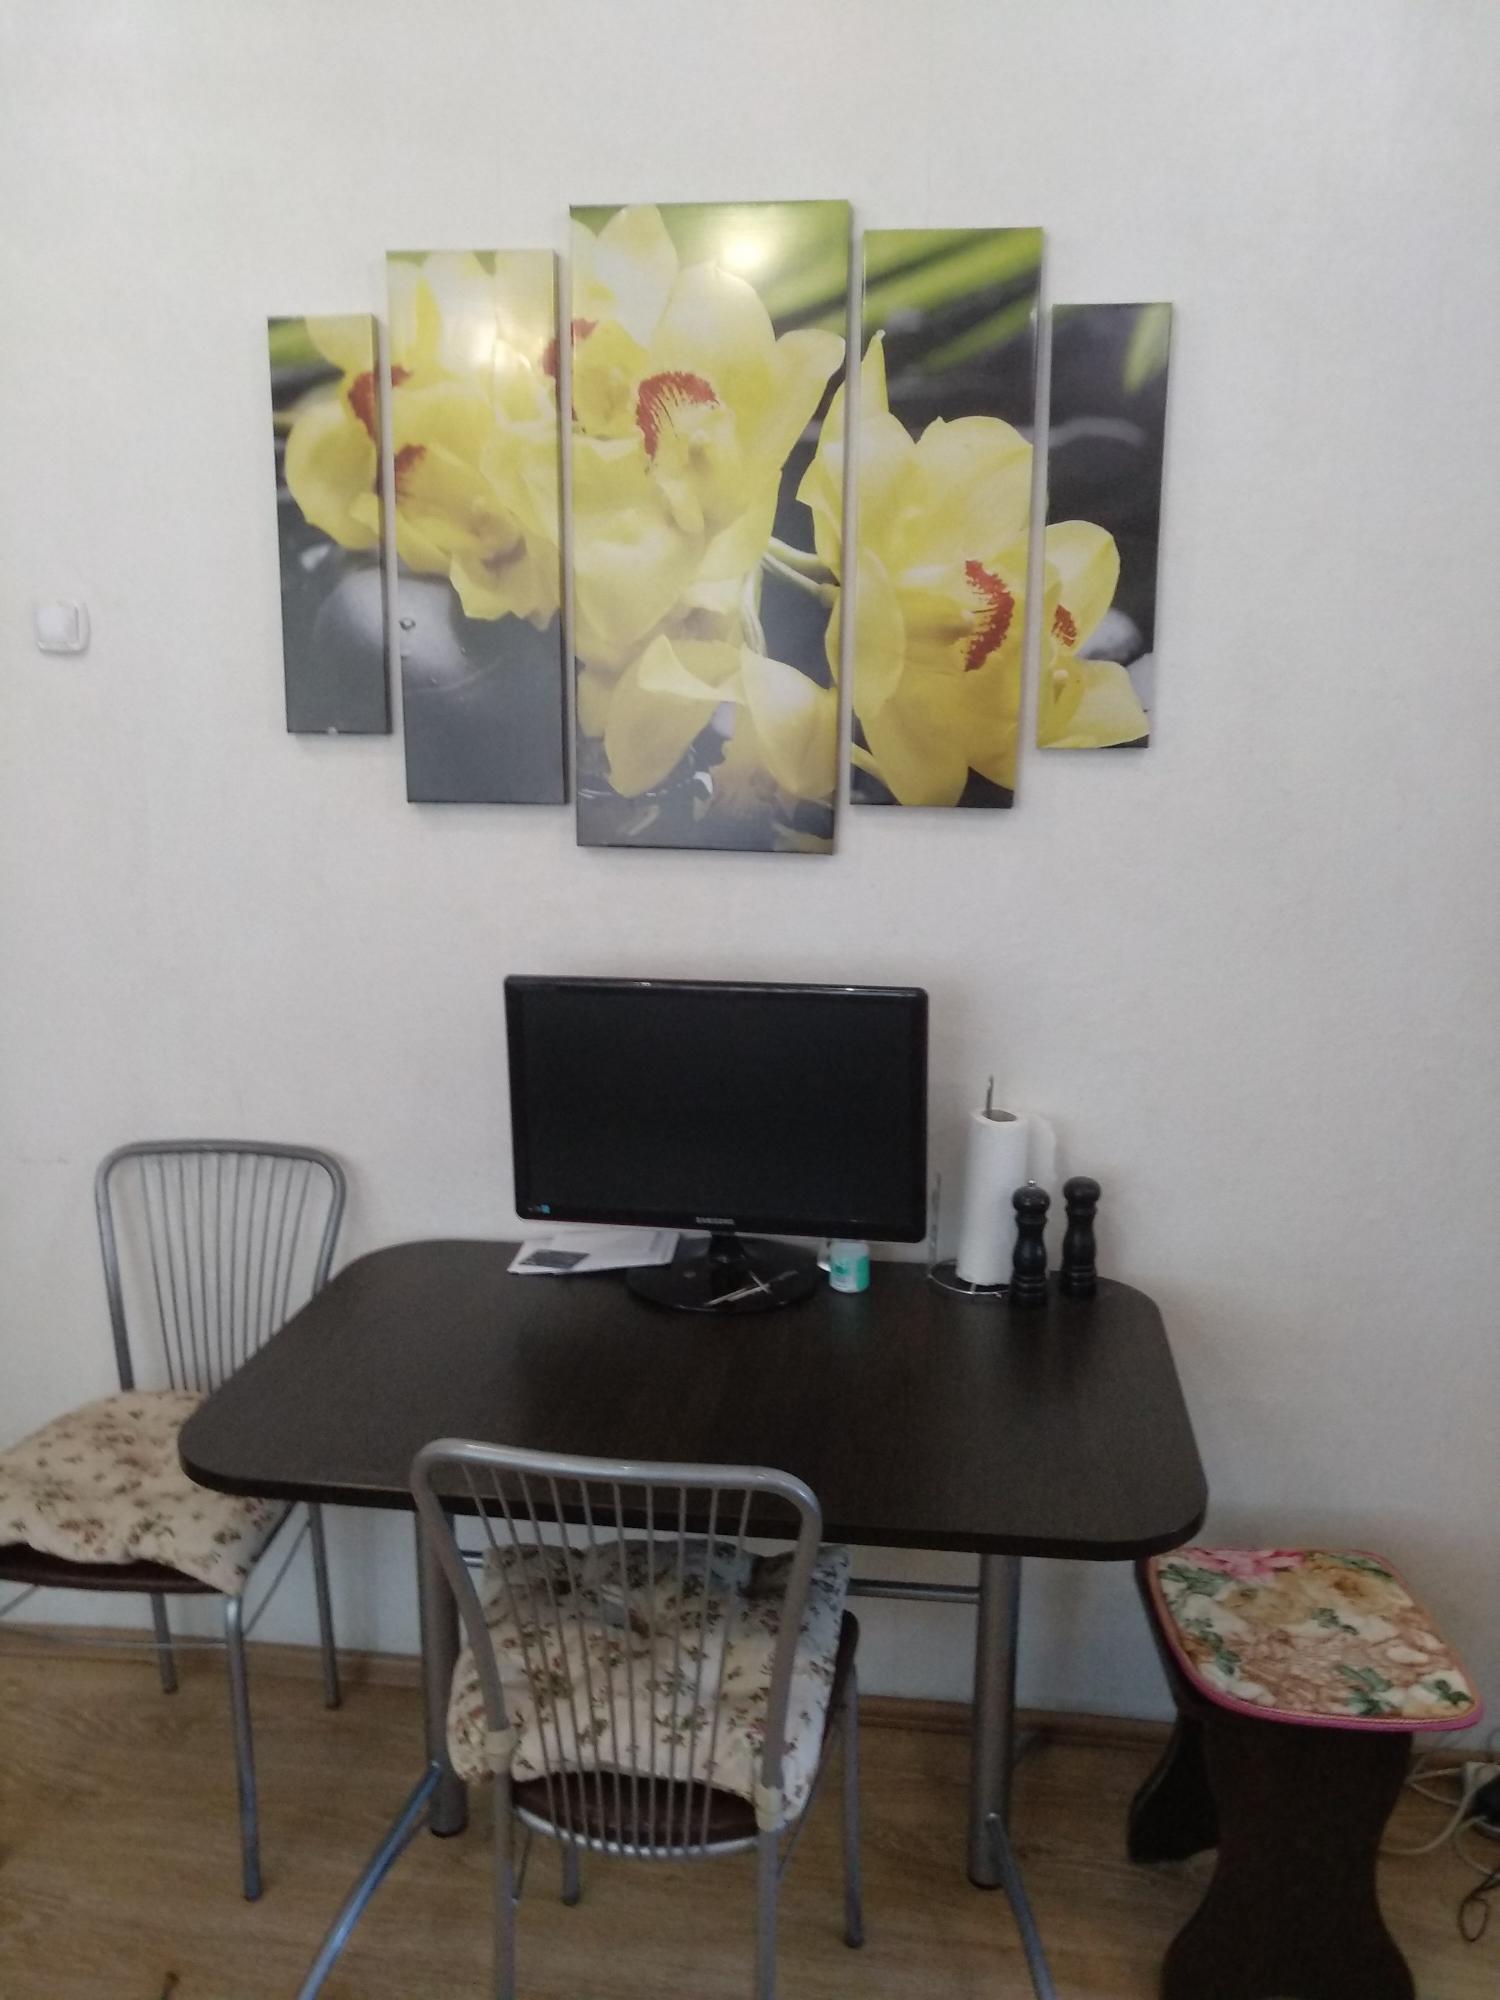 1к квартира проспект Металлургов, 33 | 13000 | аренда в Красноярске фото 1